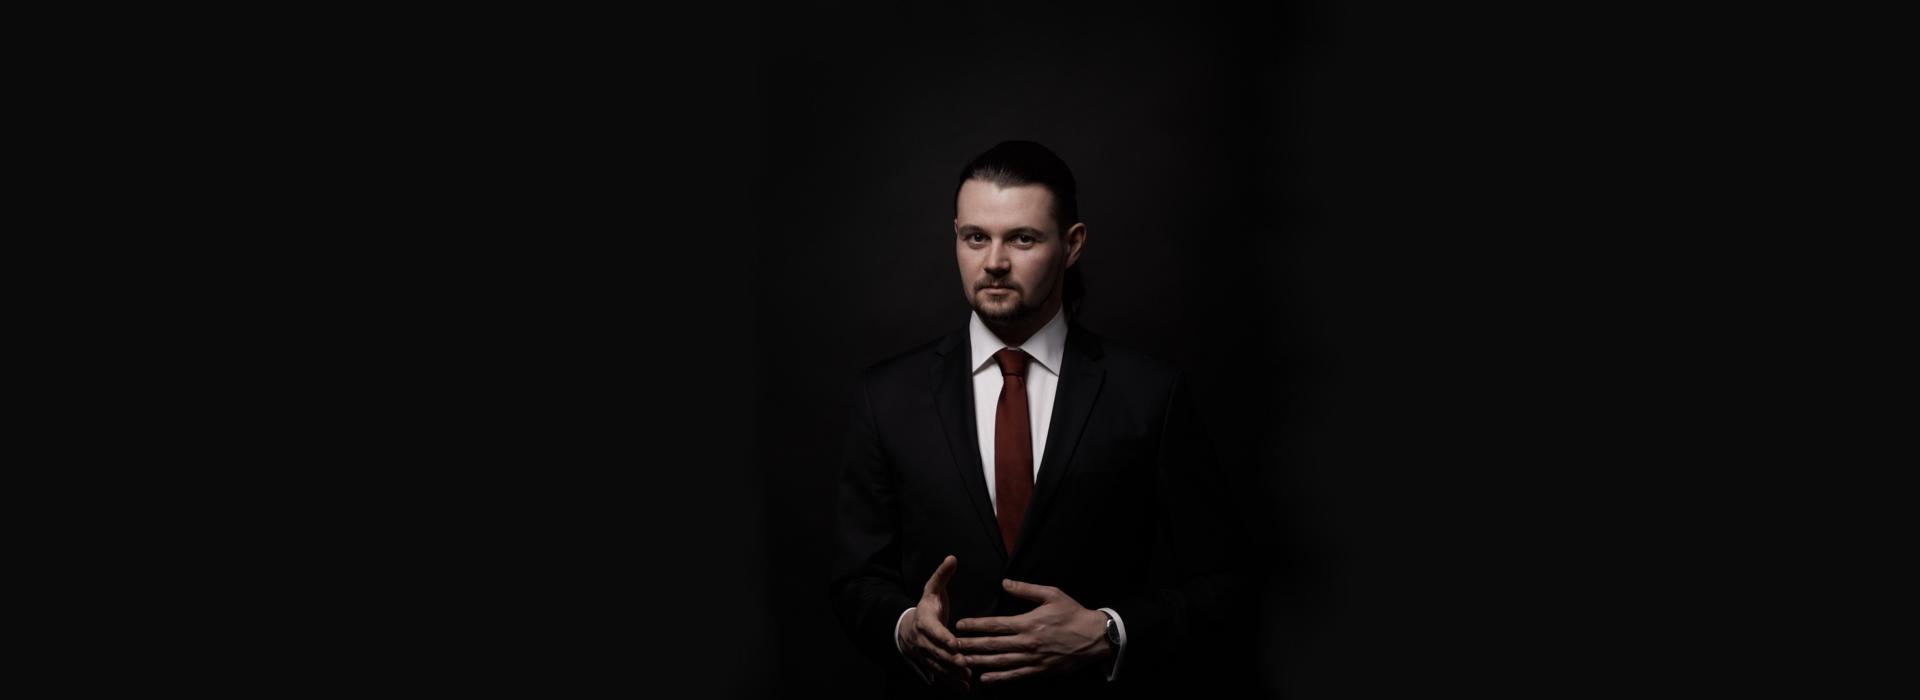 Krzysztof Osiak | Adwokat Siedlce